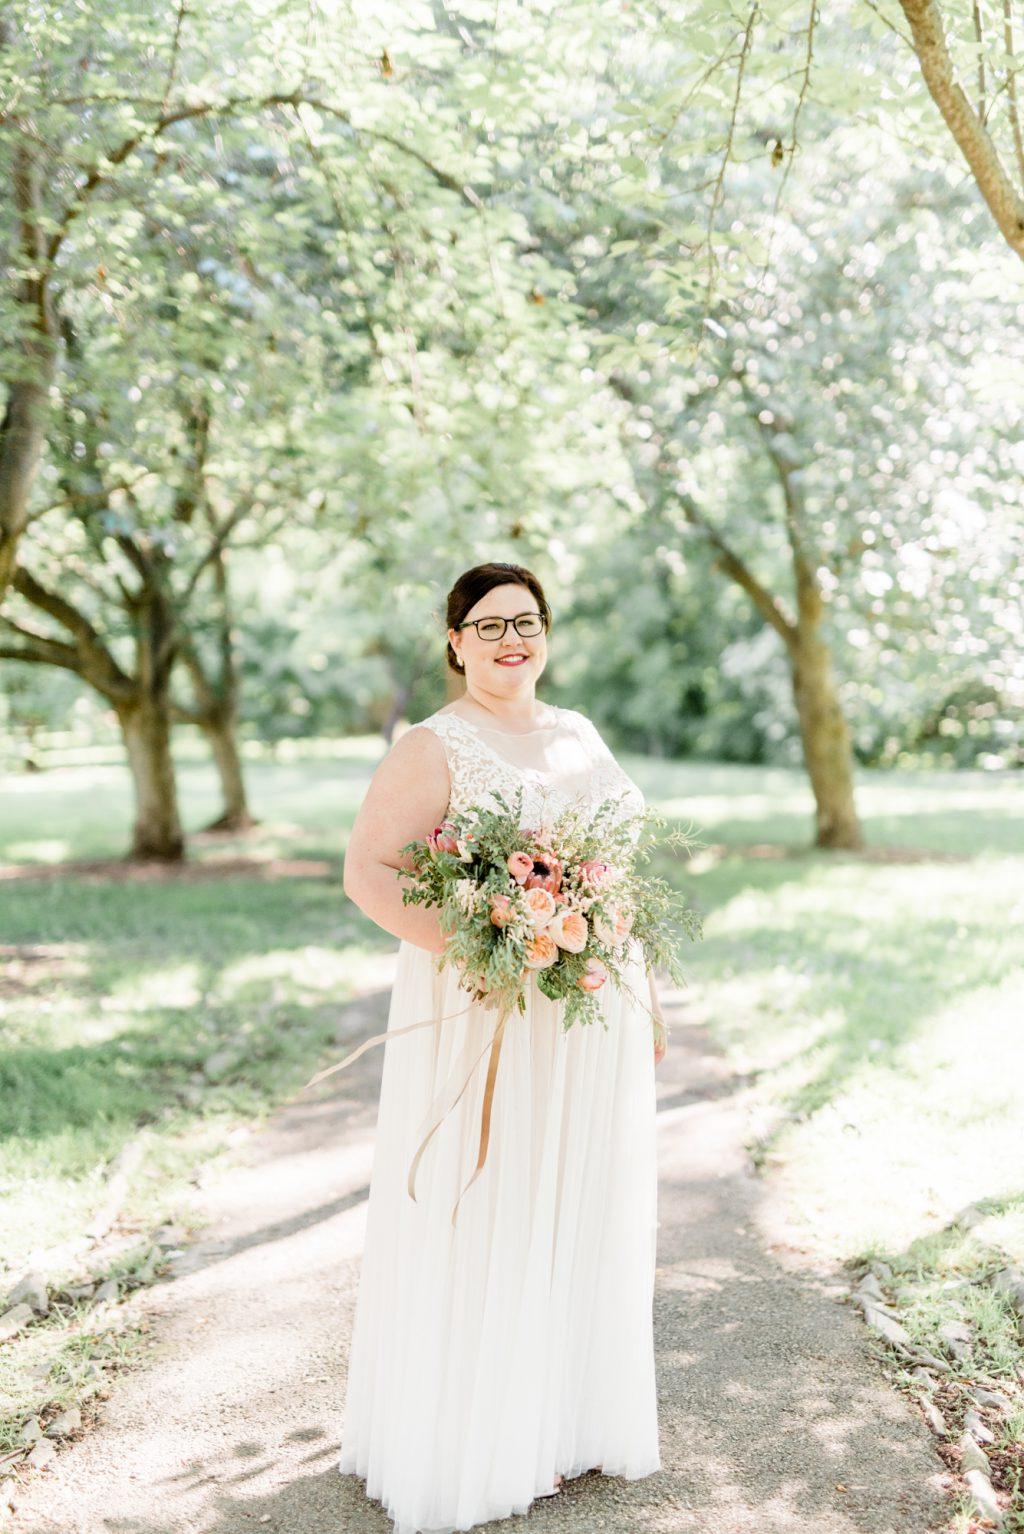 haley-richter-photo-west-chester-summer-wedding-boxcar-brewery-141